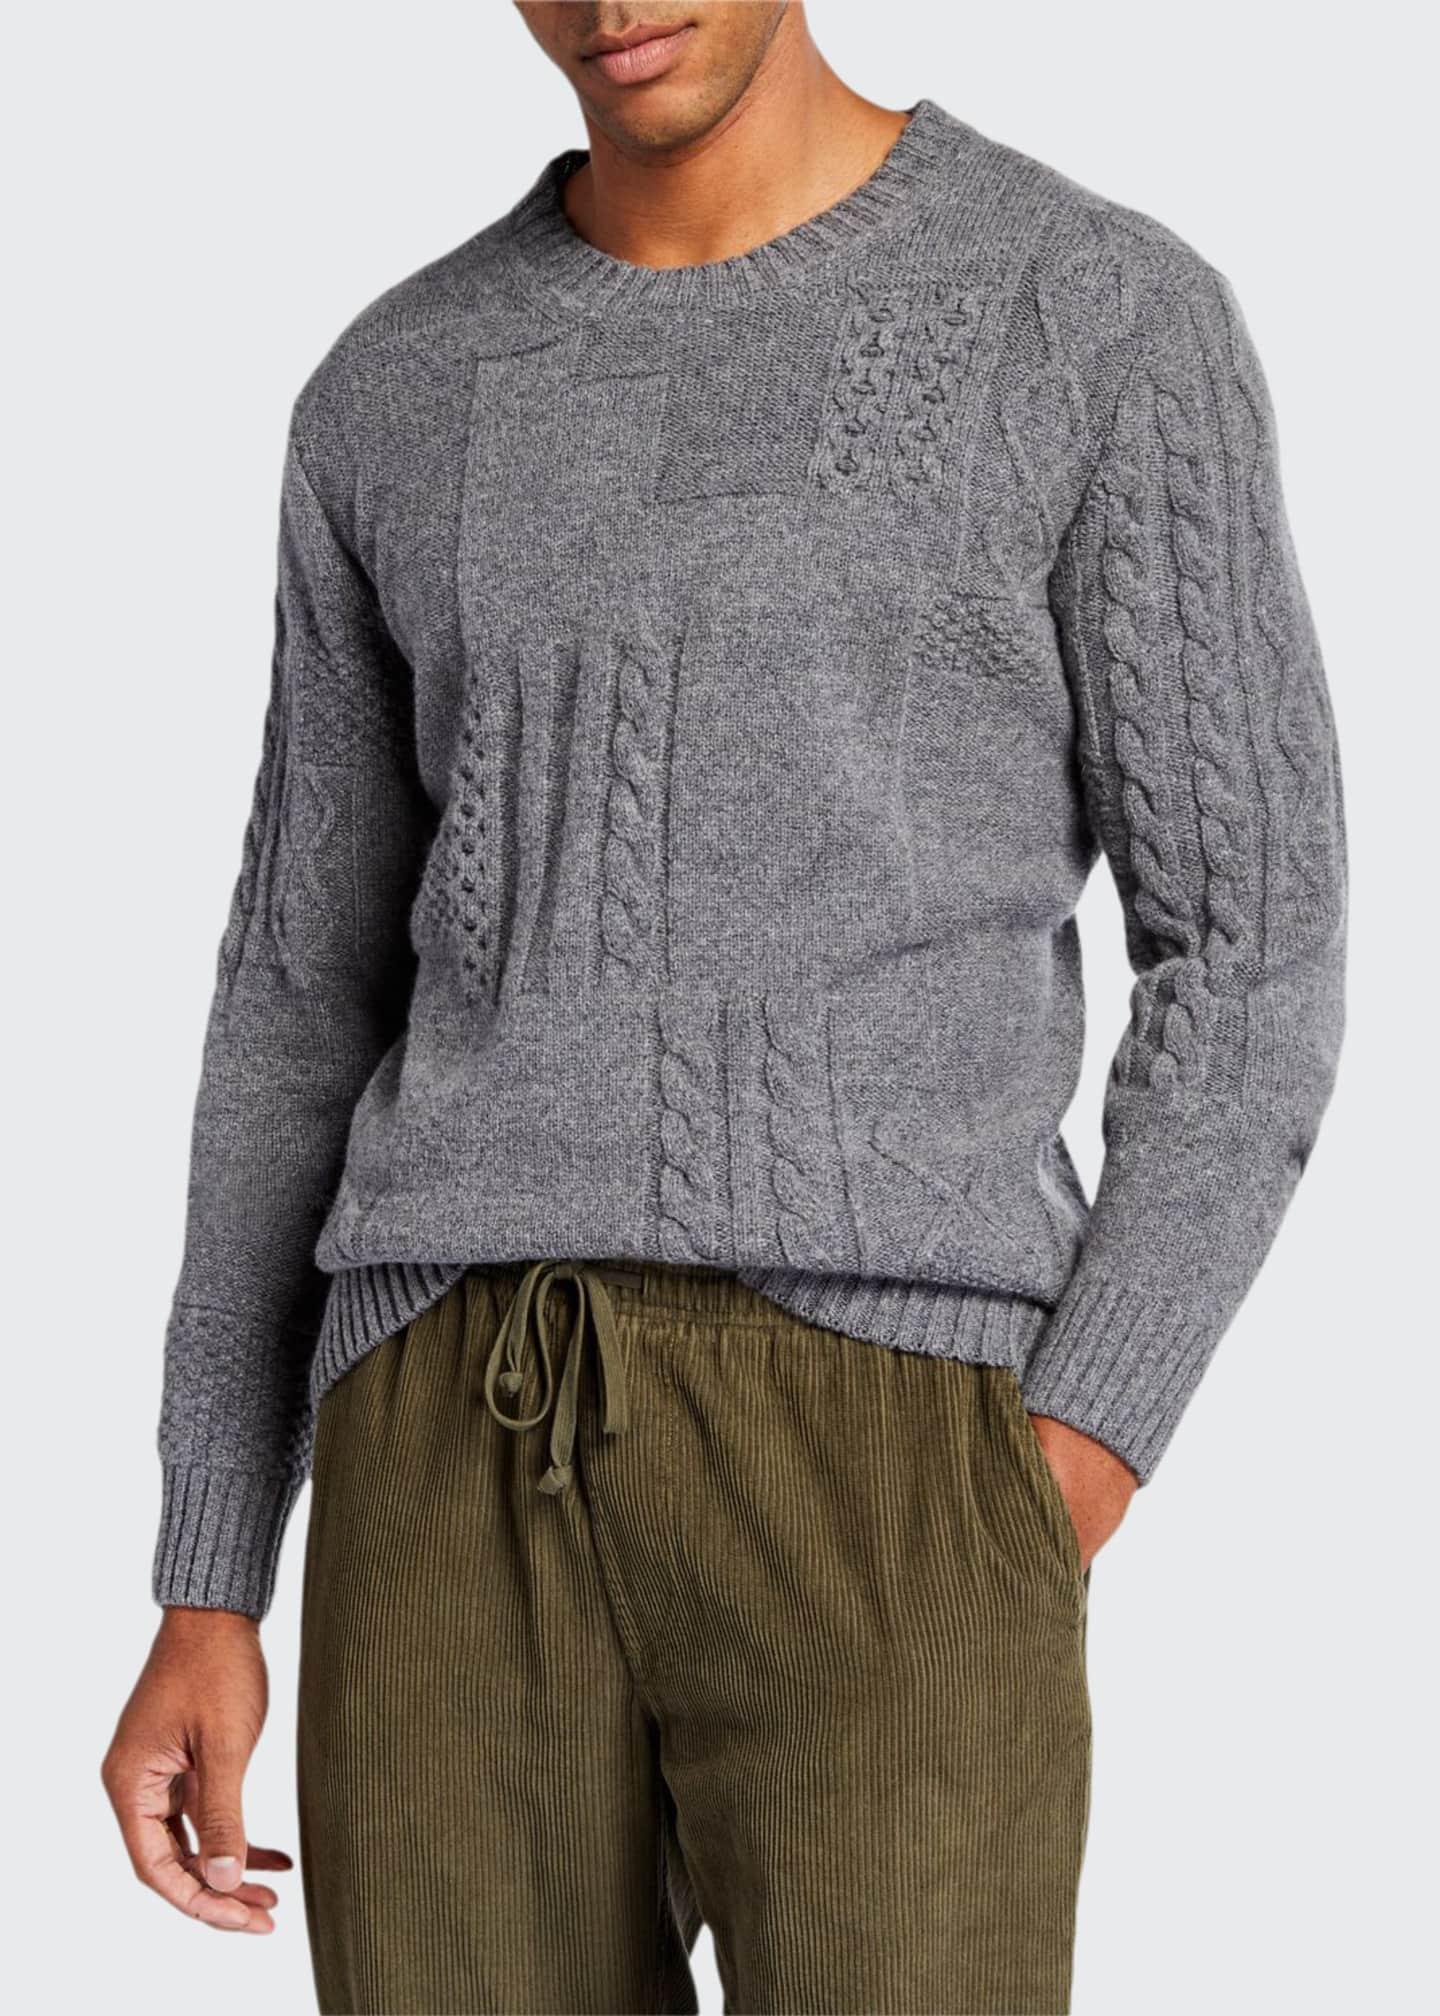 Country of Origin, Ltd. Men's Patchwork Cable-Knit Crewneck